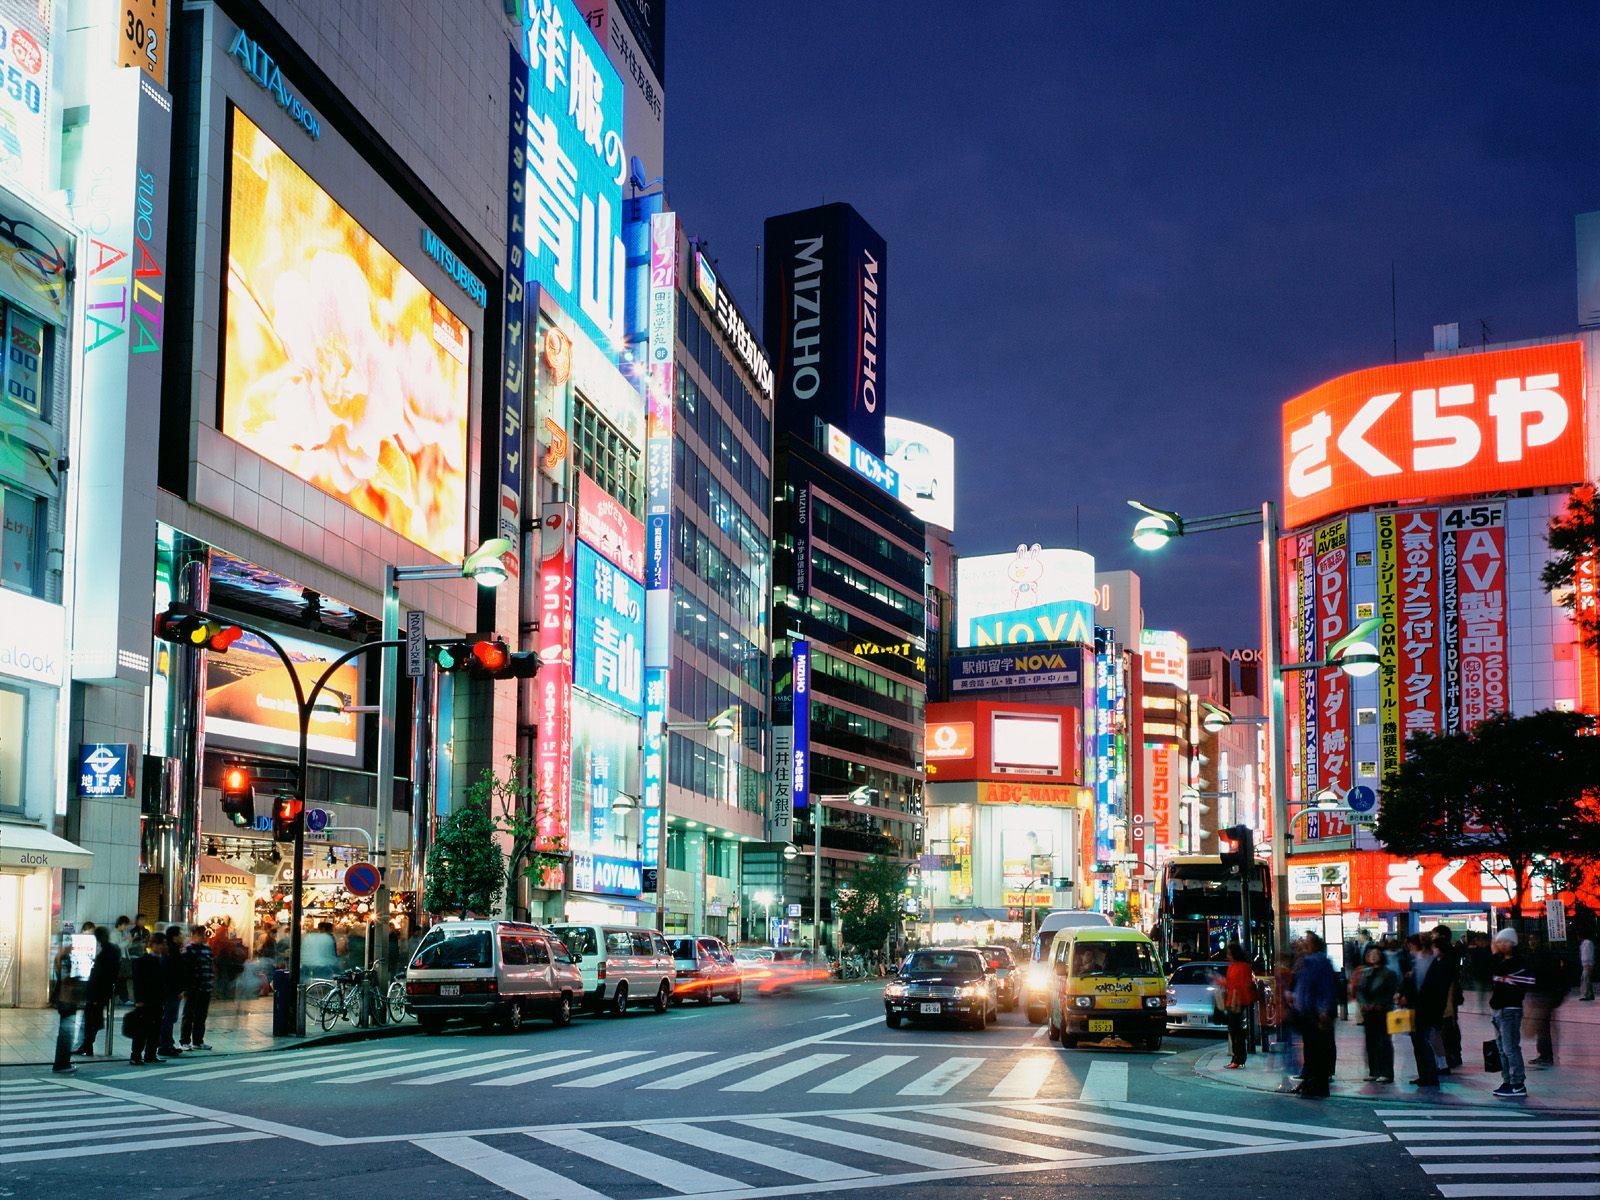 http://zwierciadlo.pl/wp-content/uploads/2011/10/EAST-SHINJUKU-TOKYO-JAPAN.jpg